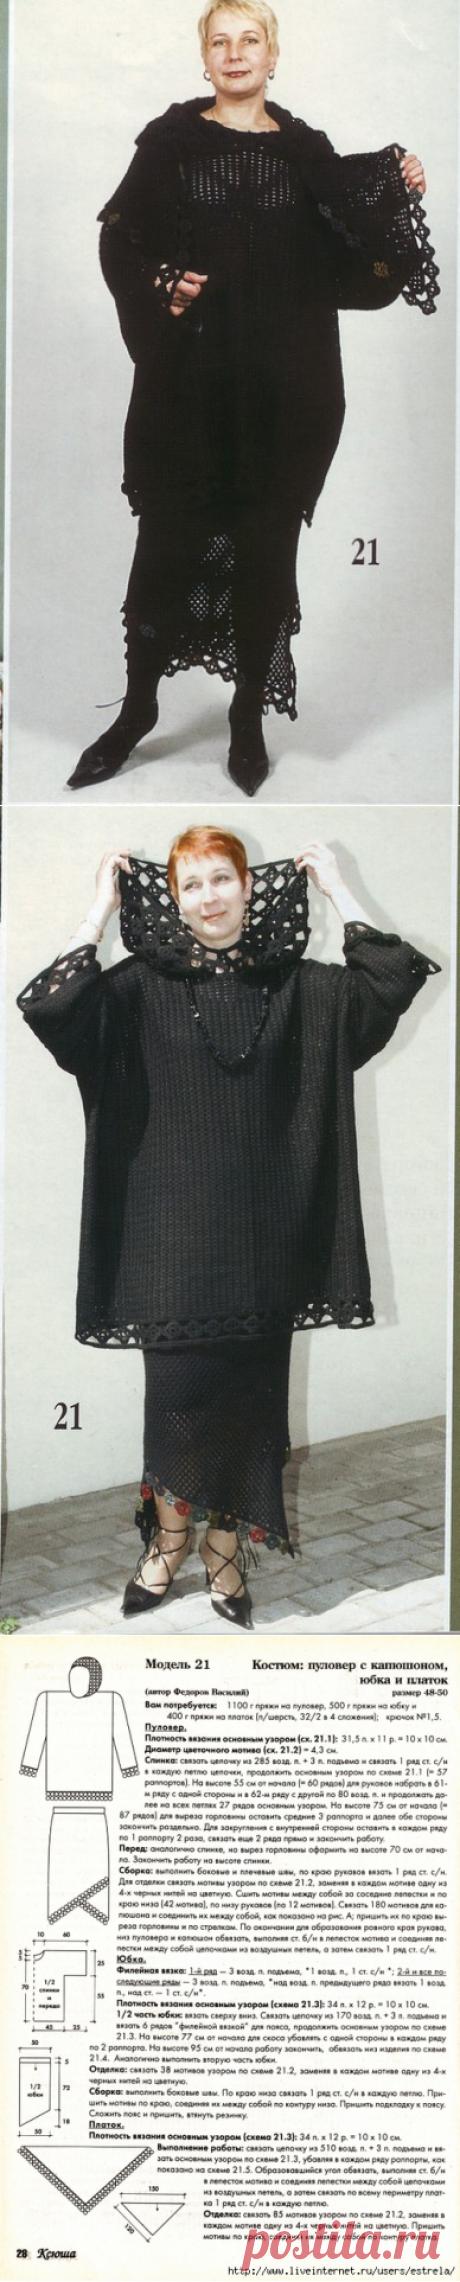 Костюм: пуловер с капюшоном, юбка и платок